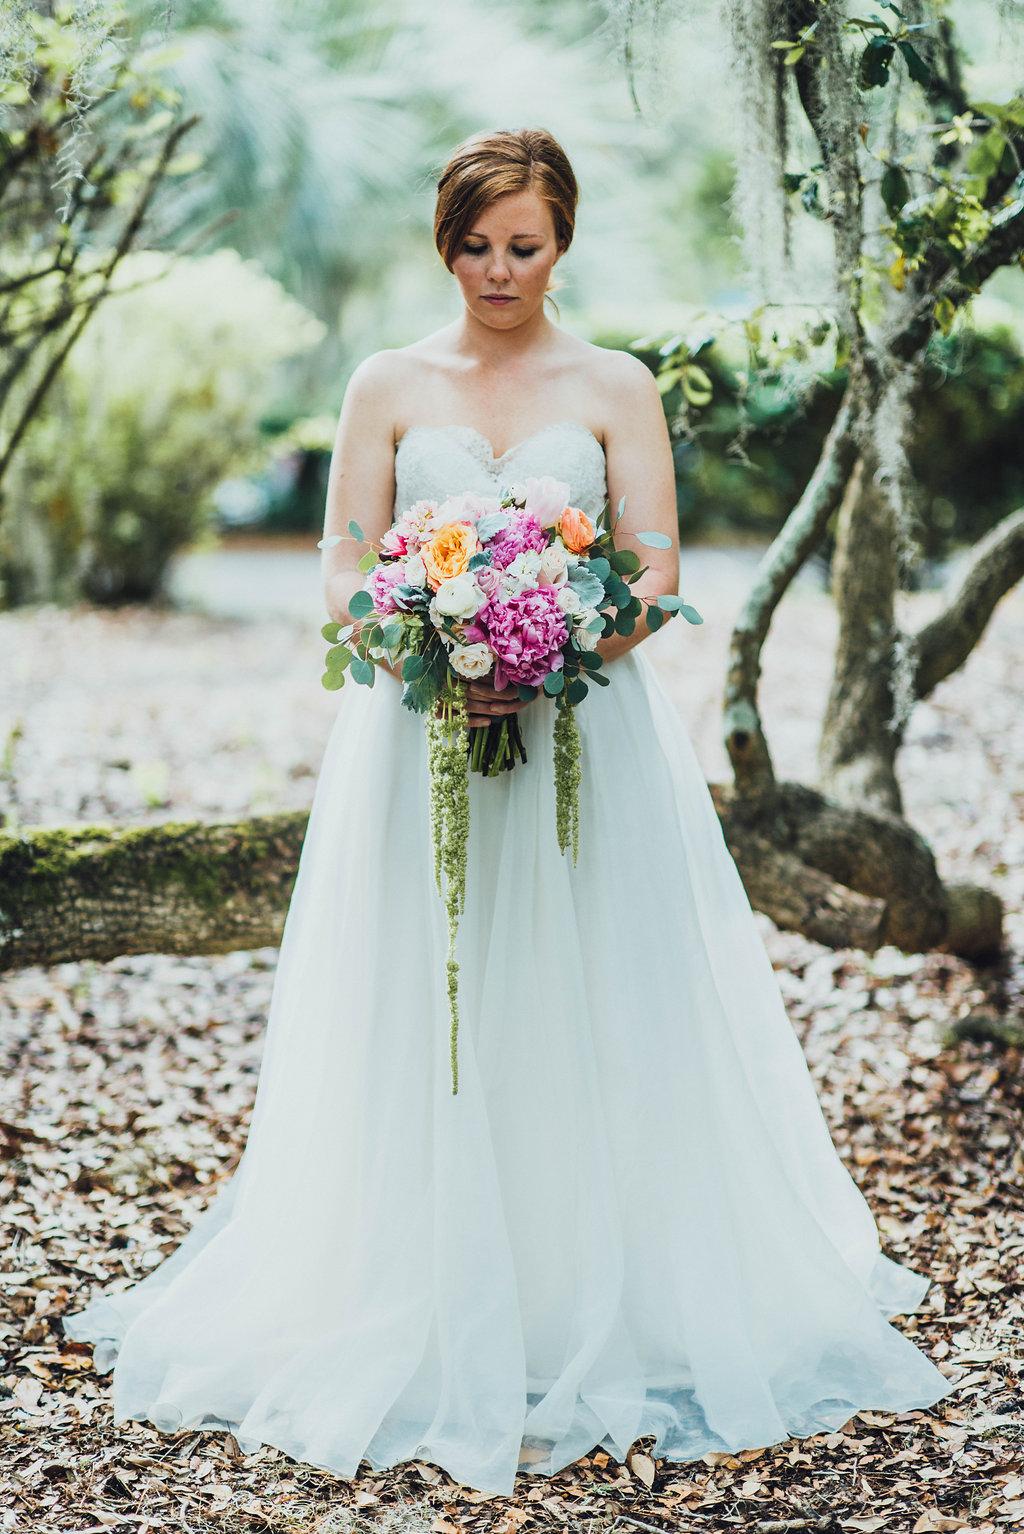 Urban-Poppy-Southern-Wedding-Mallory-and-Justin-photography-ivory-and-beau-bridal-boutique-sarah-seven-marion-boho-bride-indie-bride-indie-wedding-dress-savannah-weddings-hilton-head-weddings-beach-wedding-11.jpg